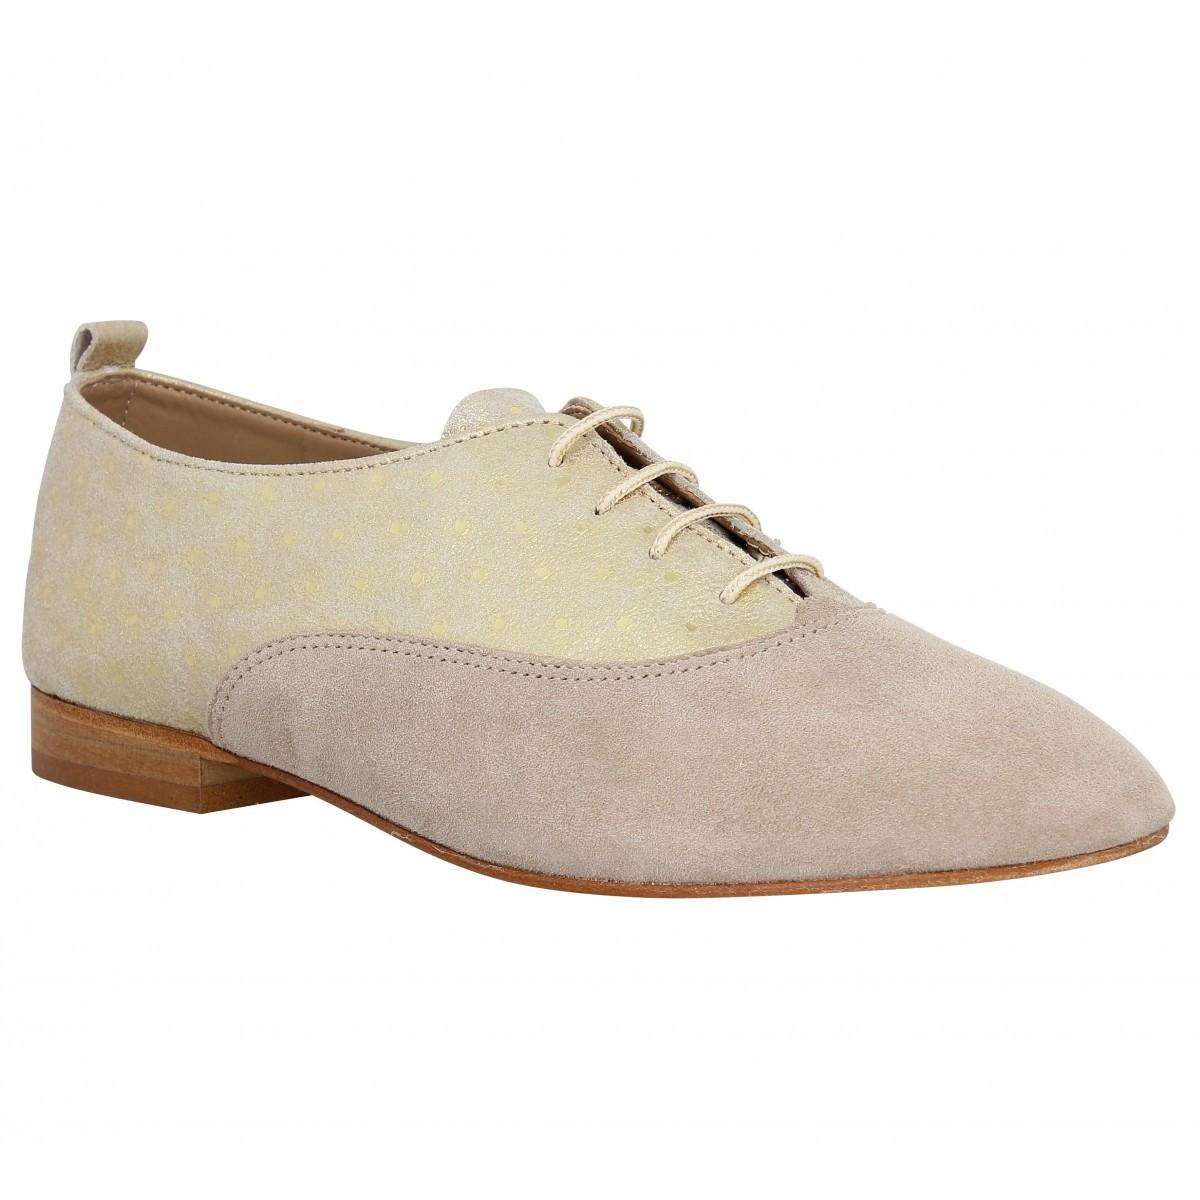 Chaussures à lacets HIRICA Bilbao Femme Beige